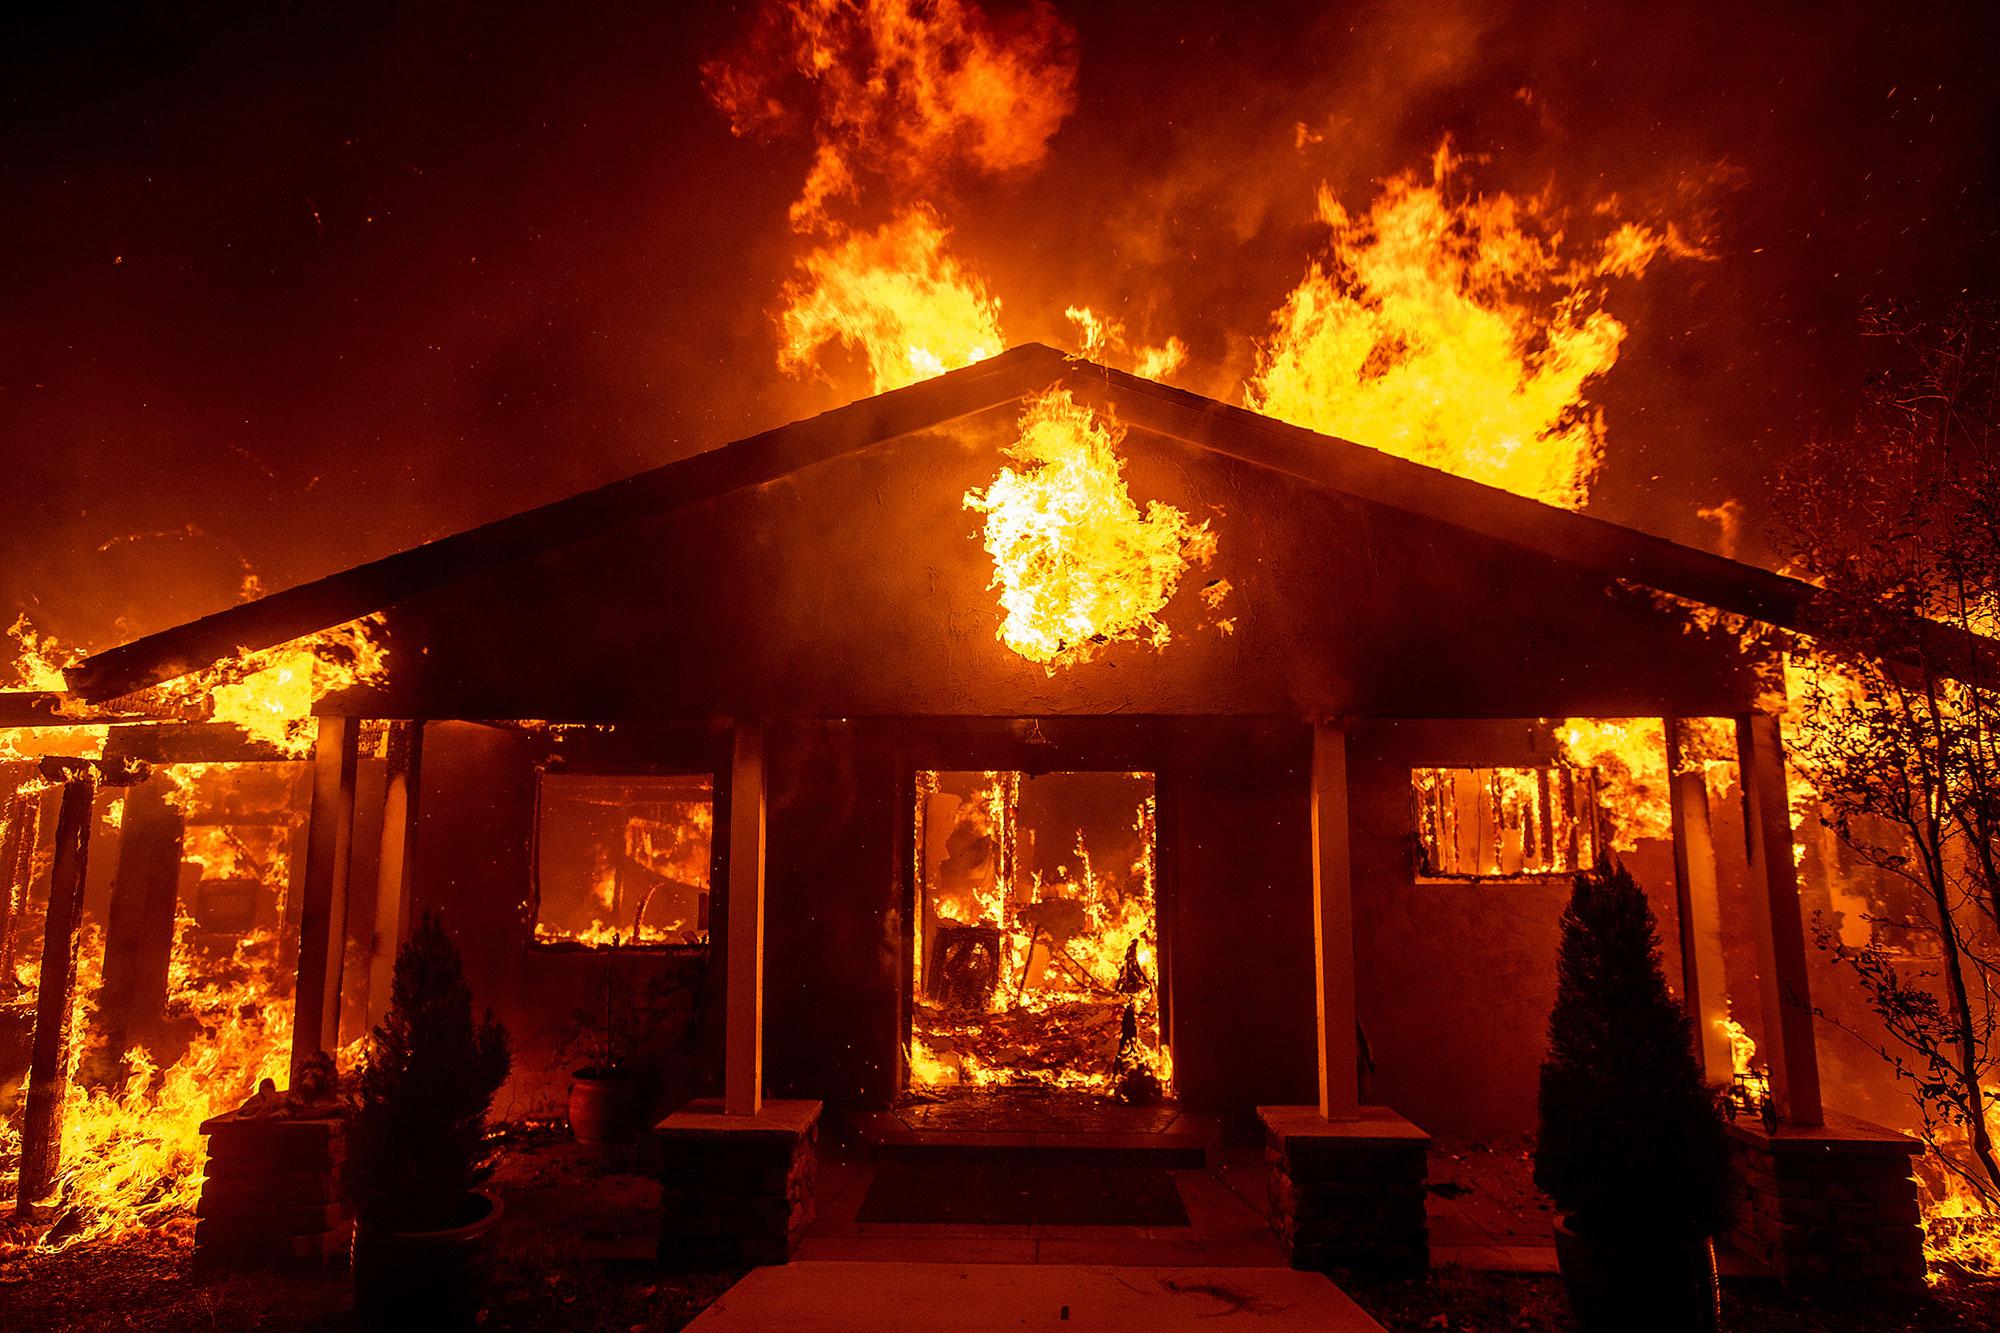 <div class='meta'><div class='origin-logo' data-origin='none'></div><span class='caption-text' data-credit='Noah Berger/AP Photo'>A home burns as the Camp Fire rages through Paradise, Calif., on Thursday, Nov. 8, 2018.</span></div>